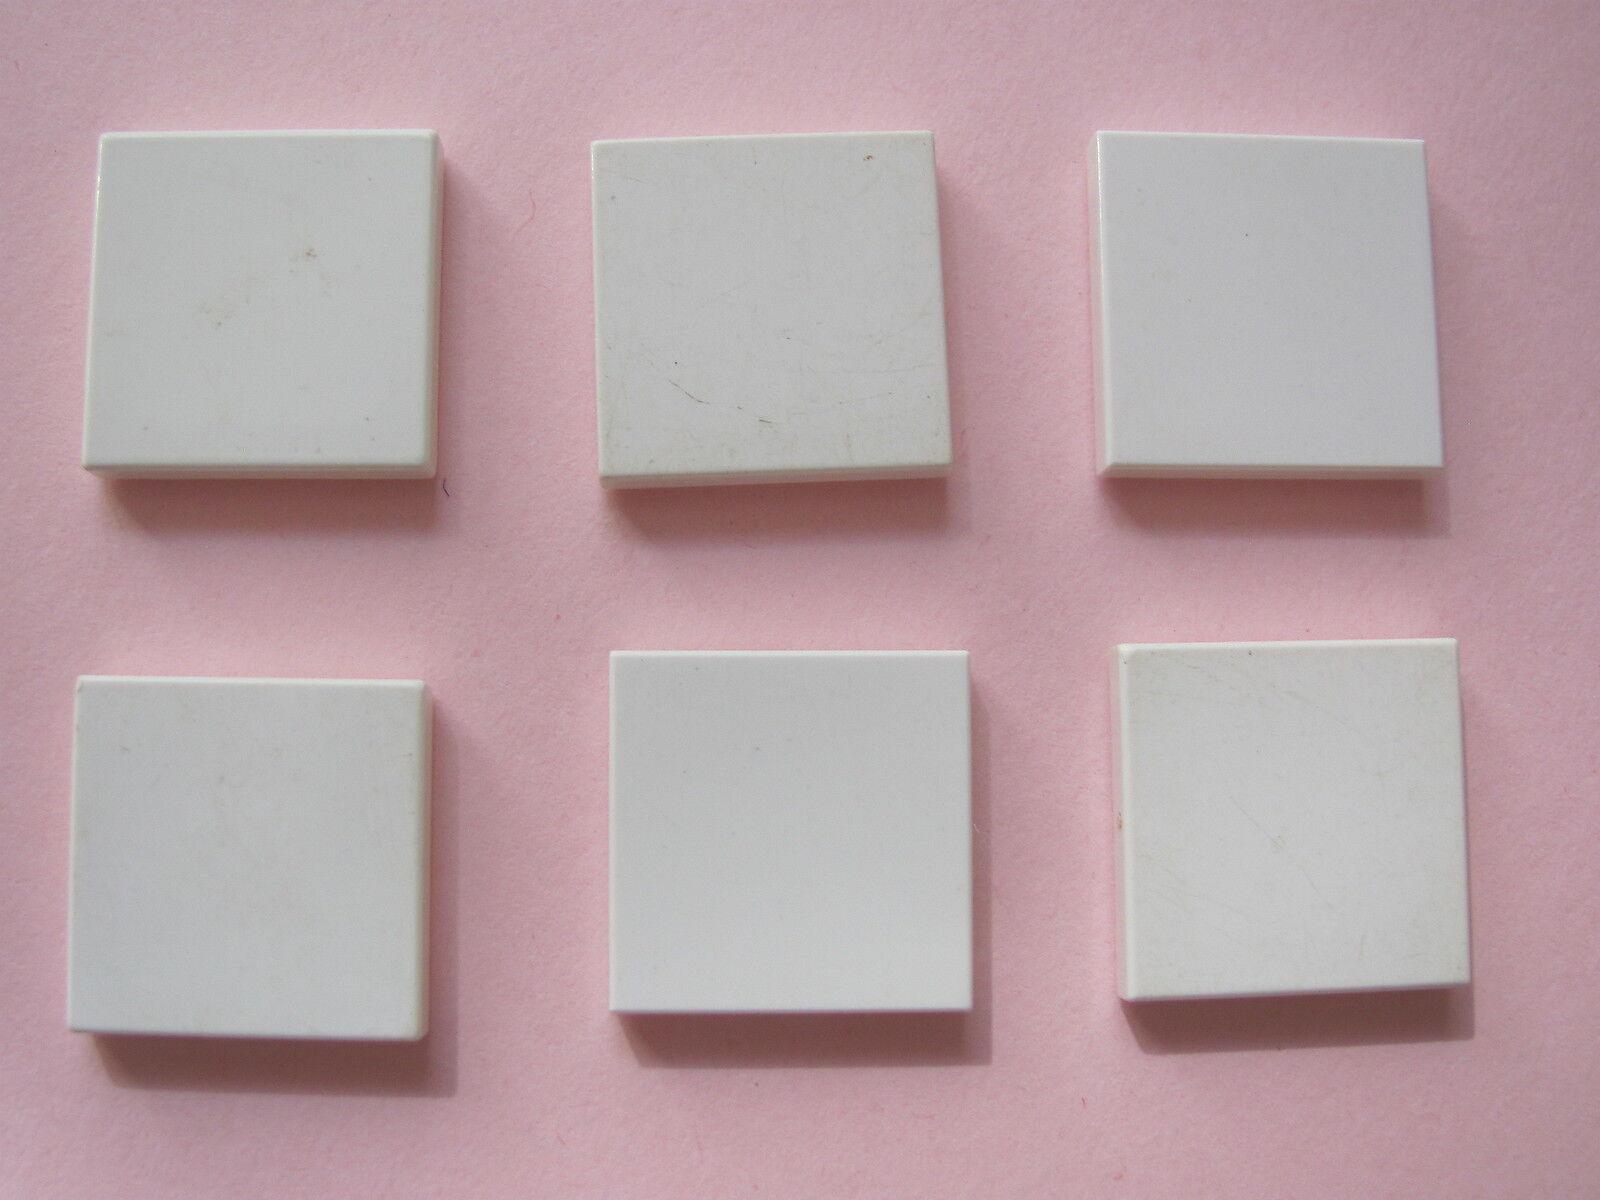 Lego 10x Tile plaque lisse 2x2 with Groove beige foncé//dark tan 3068b NEUF